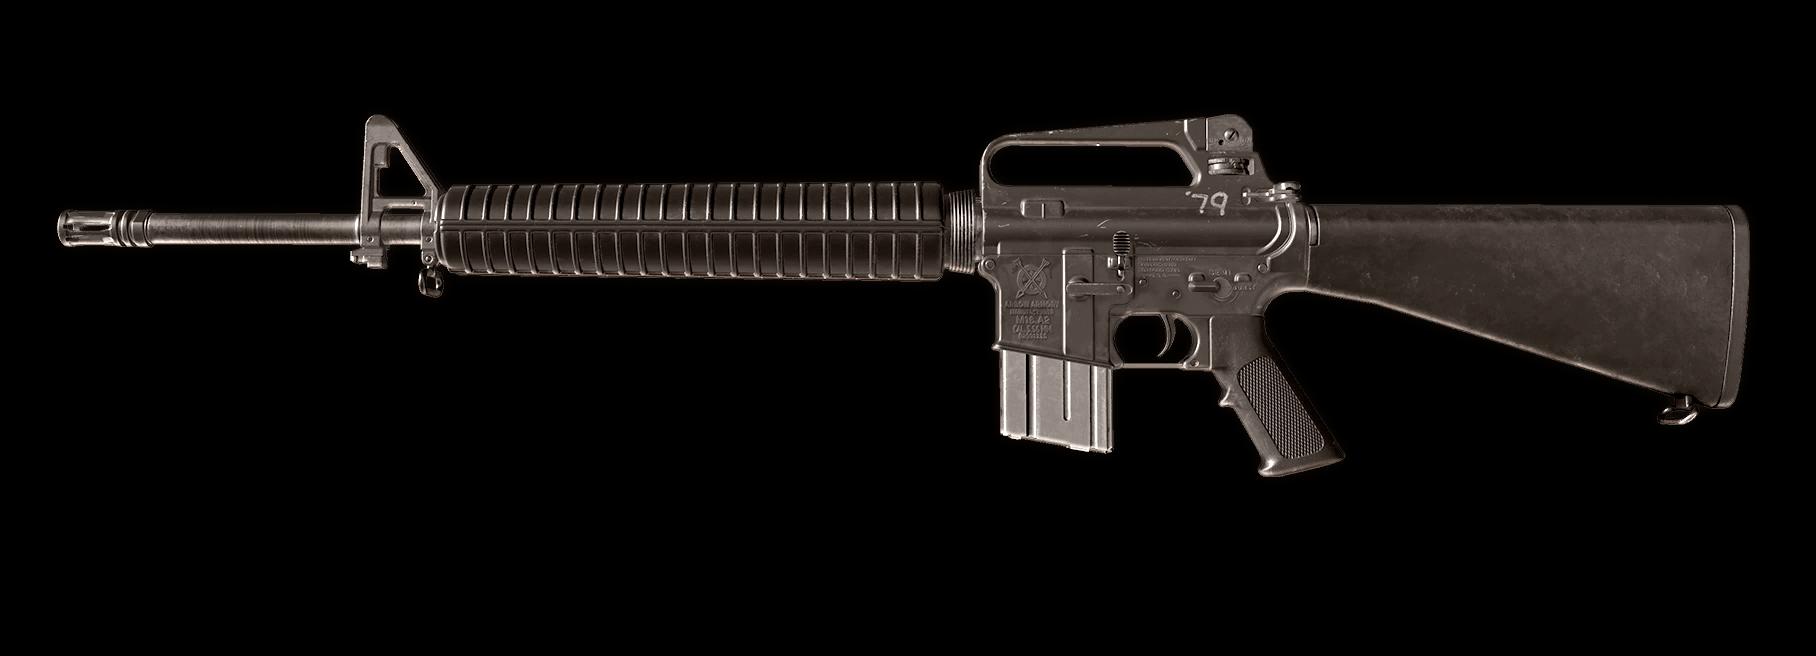 M16 Image